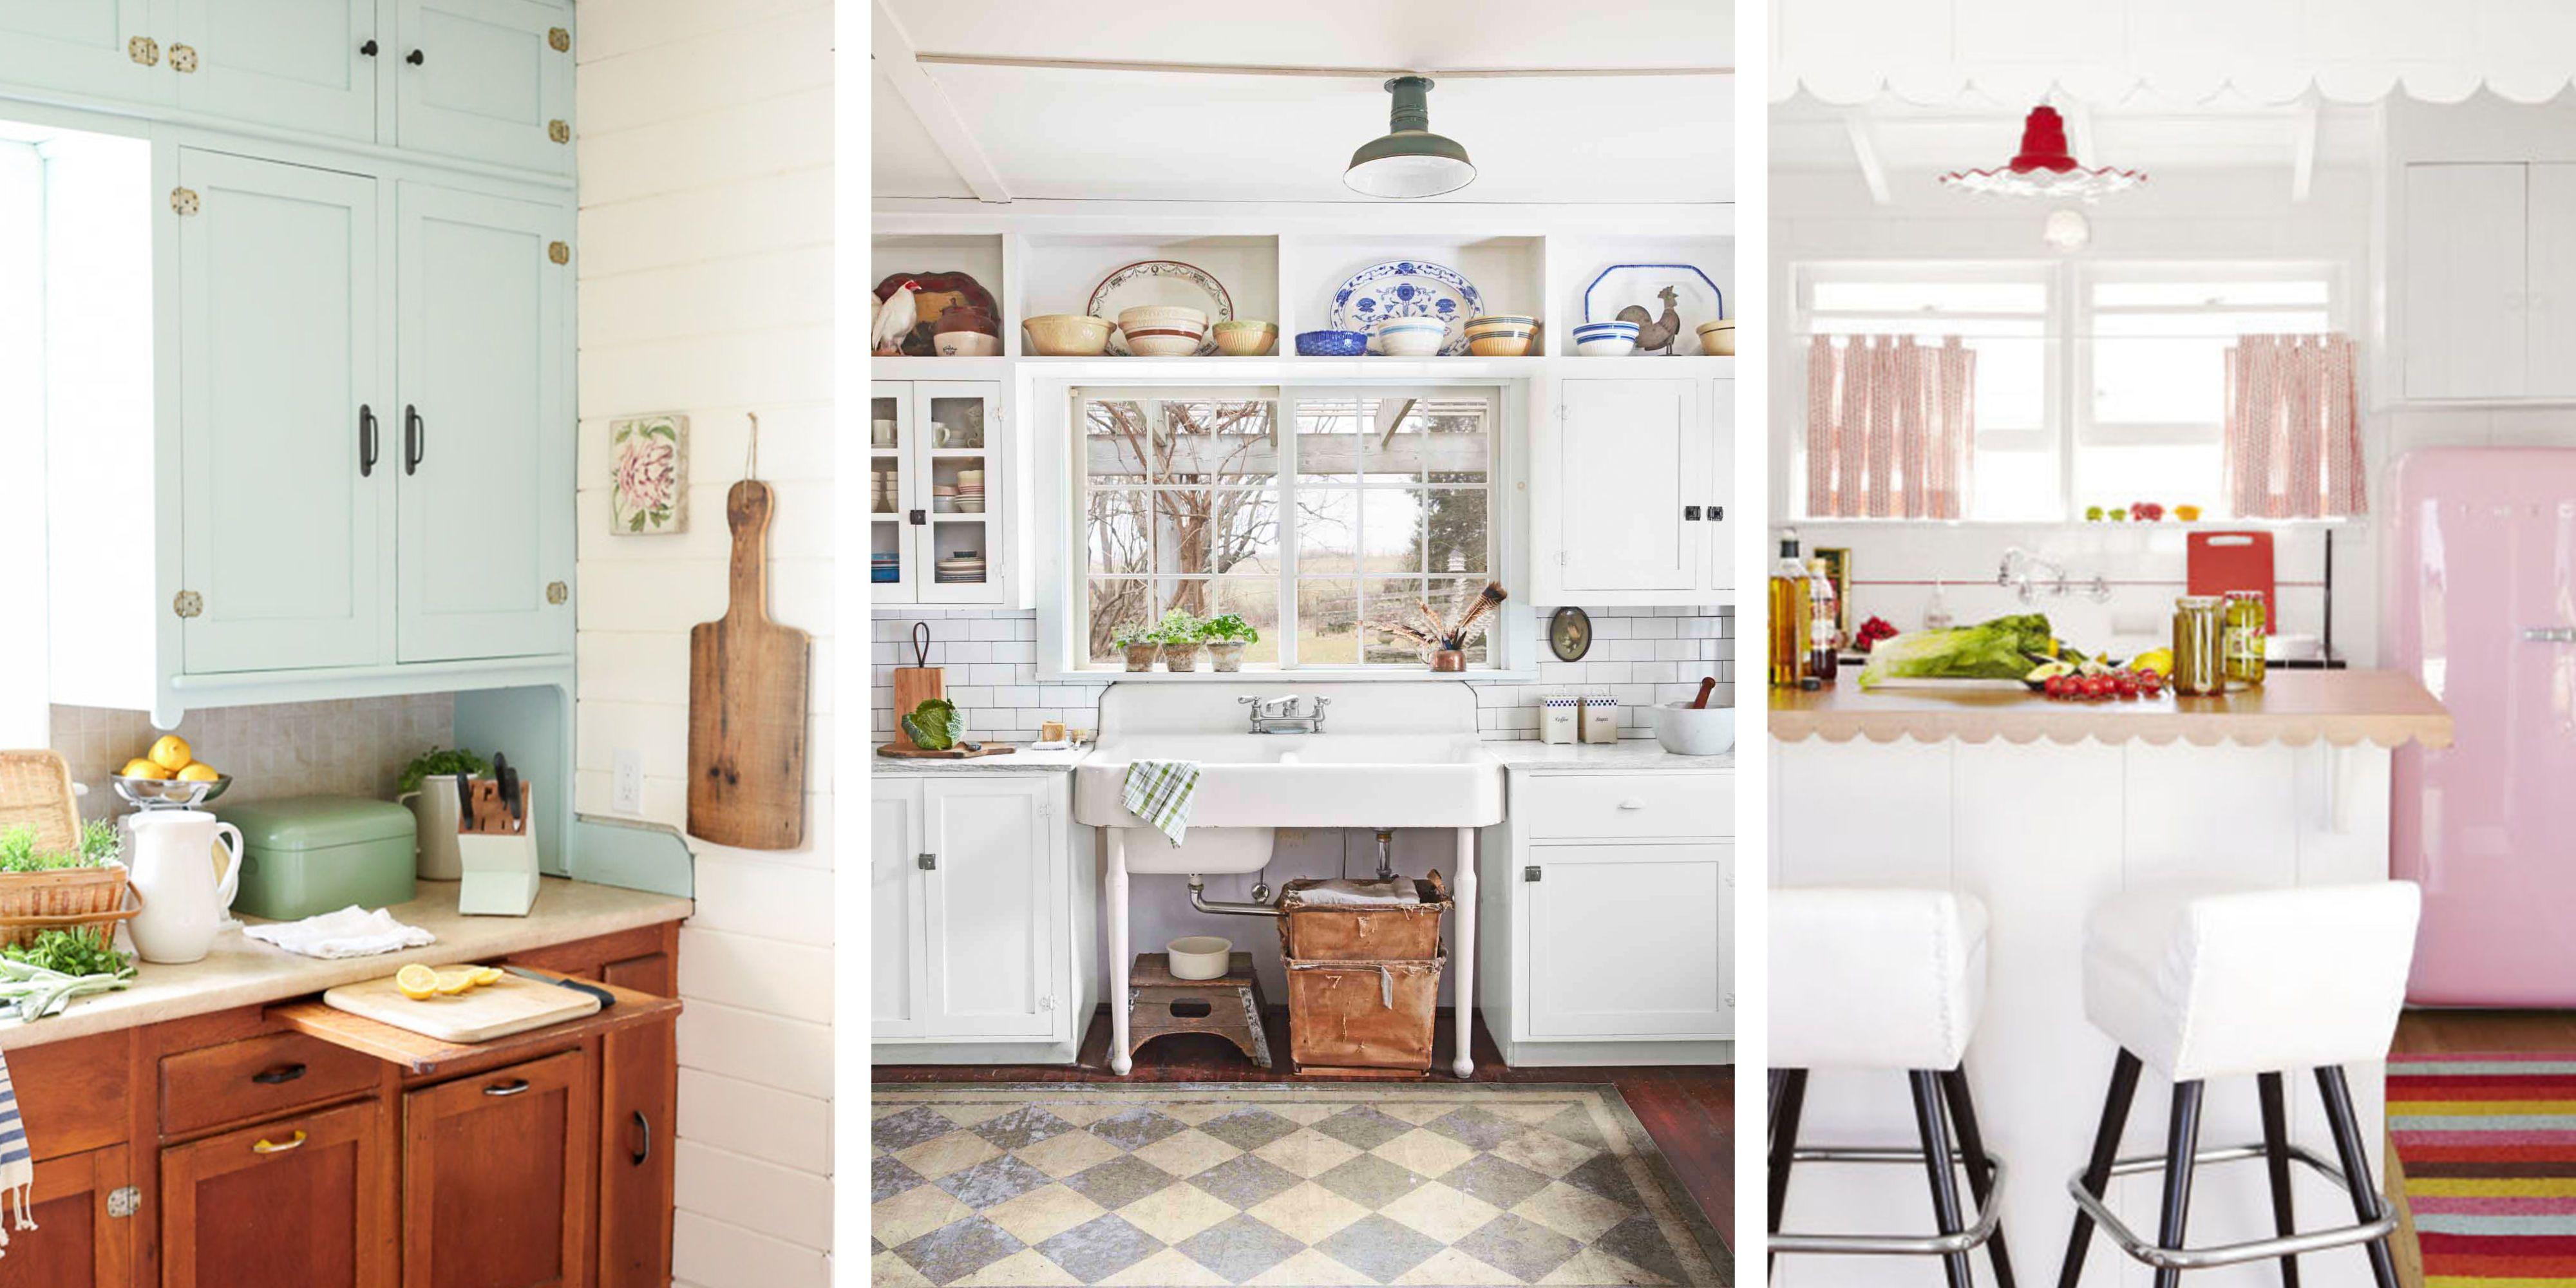 20 Vintage Kitchen Decorating Ideas Design Inspiration For Retro Rh Countryliving Com